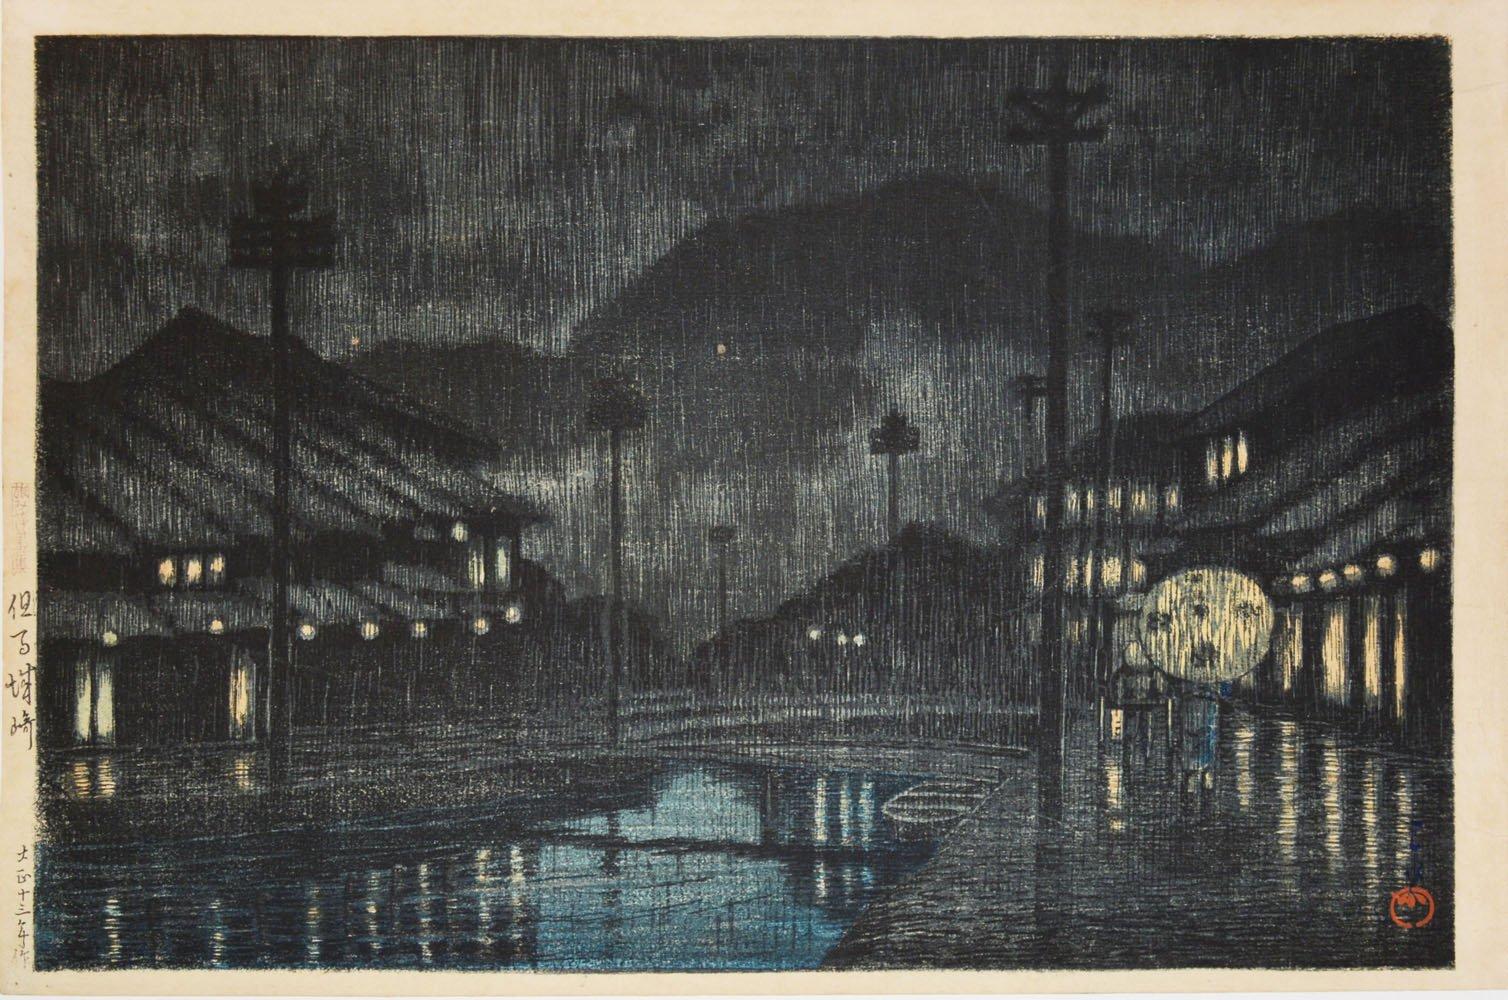 Hasui Kawase 1924 Kinosaki at Tajima Estampe japonaise Shin hanga